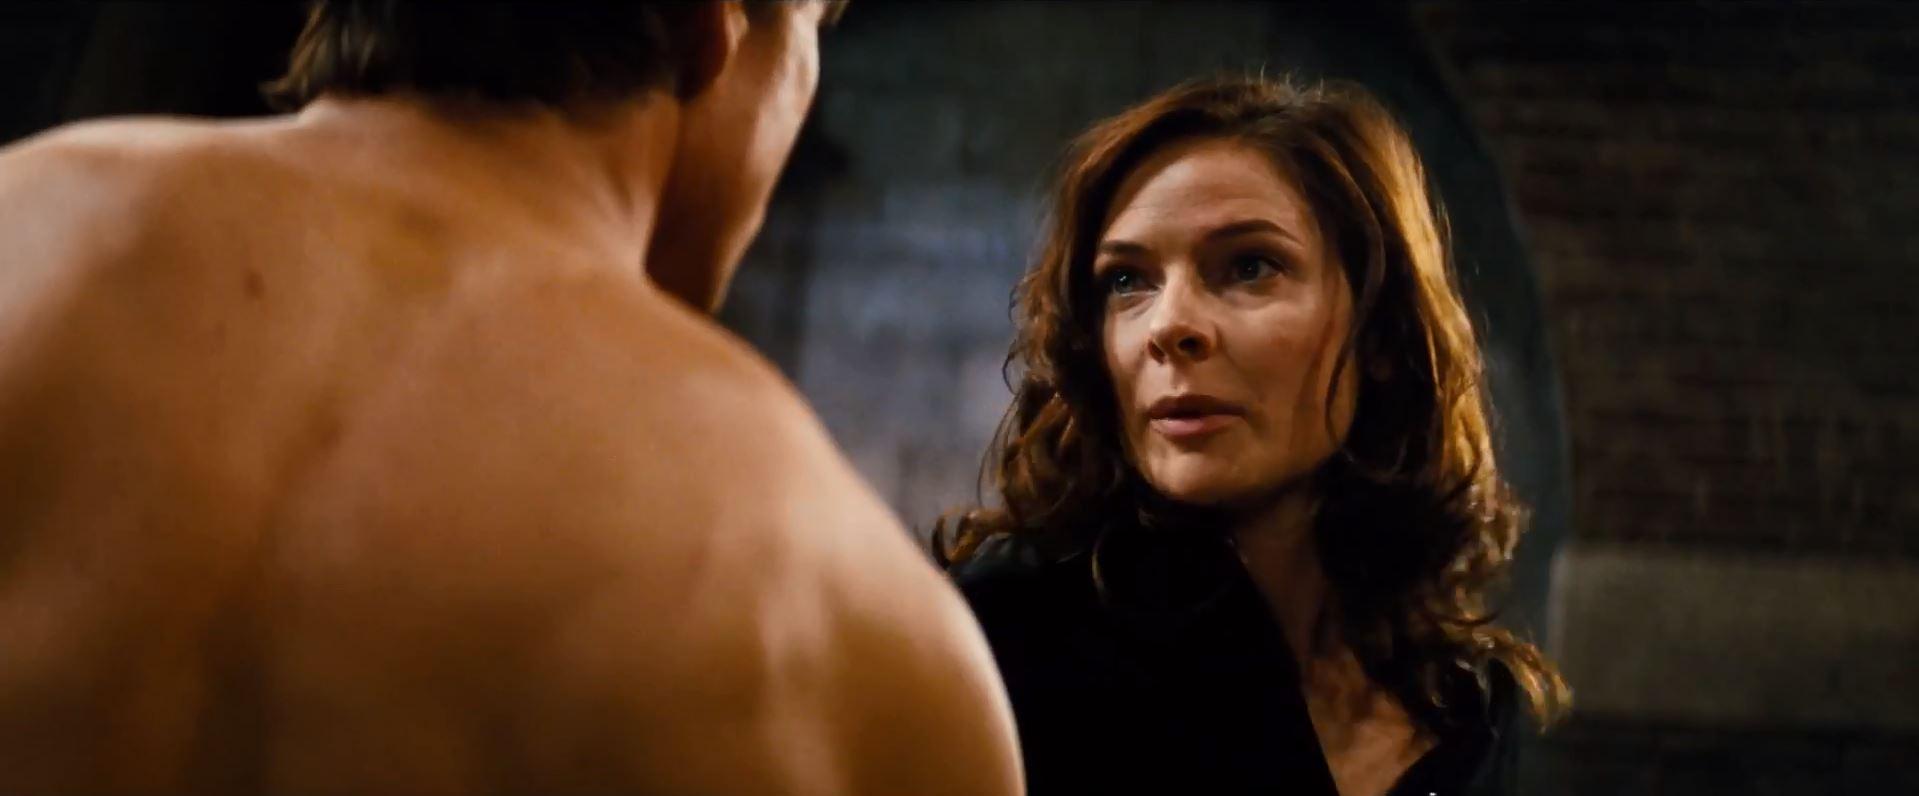 Rebecca Ferguson. Mission Impossible Rogue Nation.